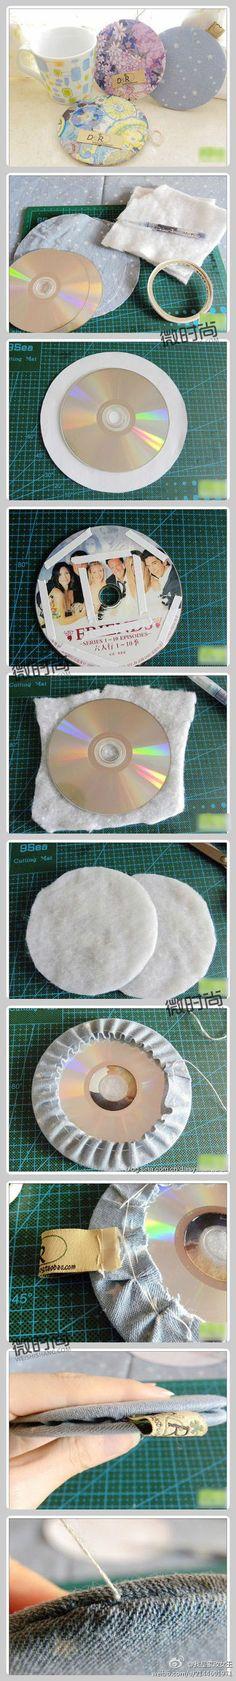 excellent recycling idea